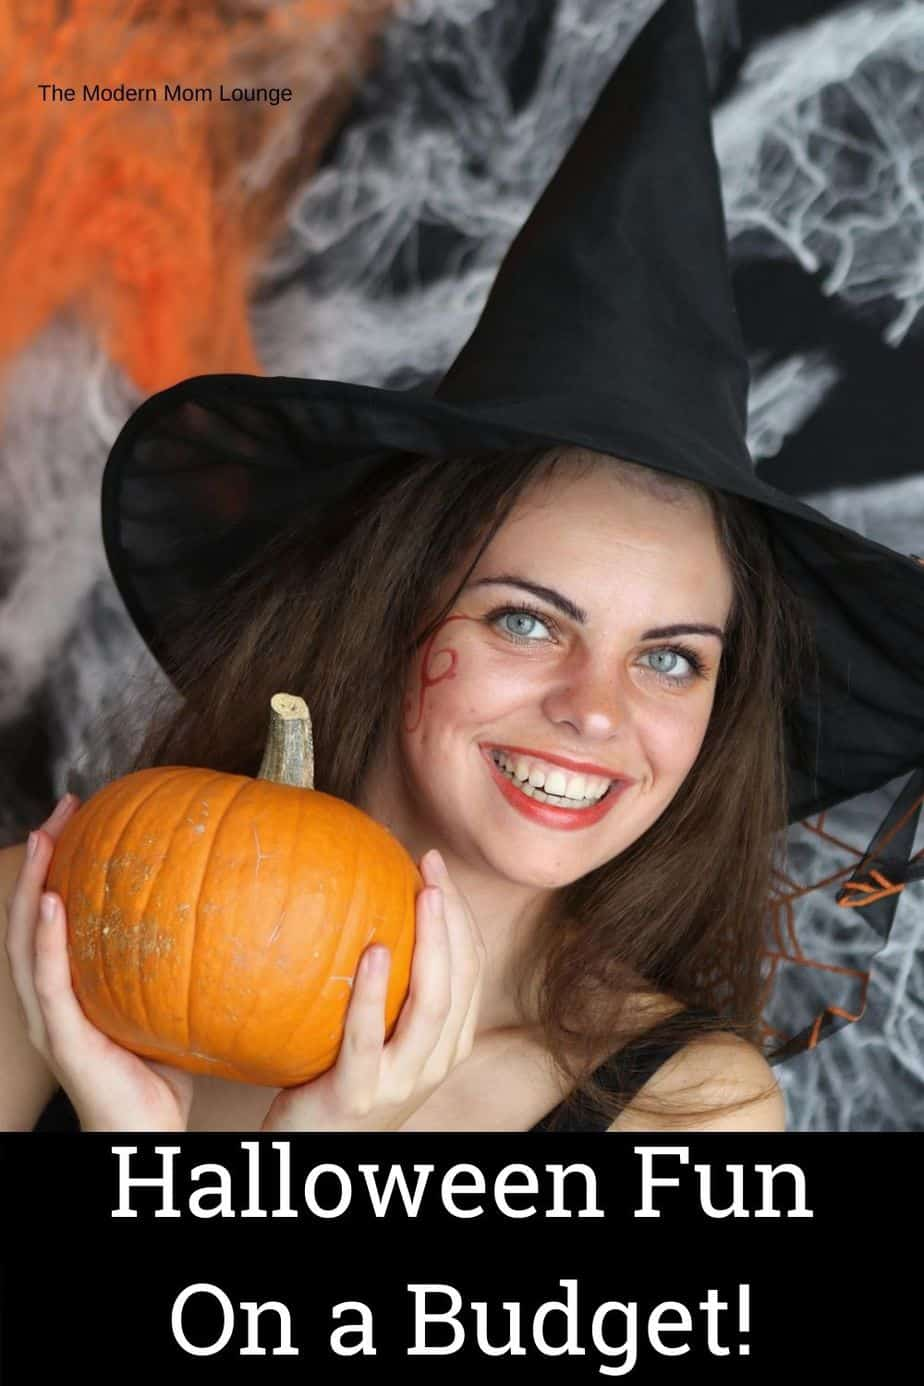 Halloween Fun On a Budget!